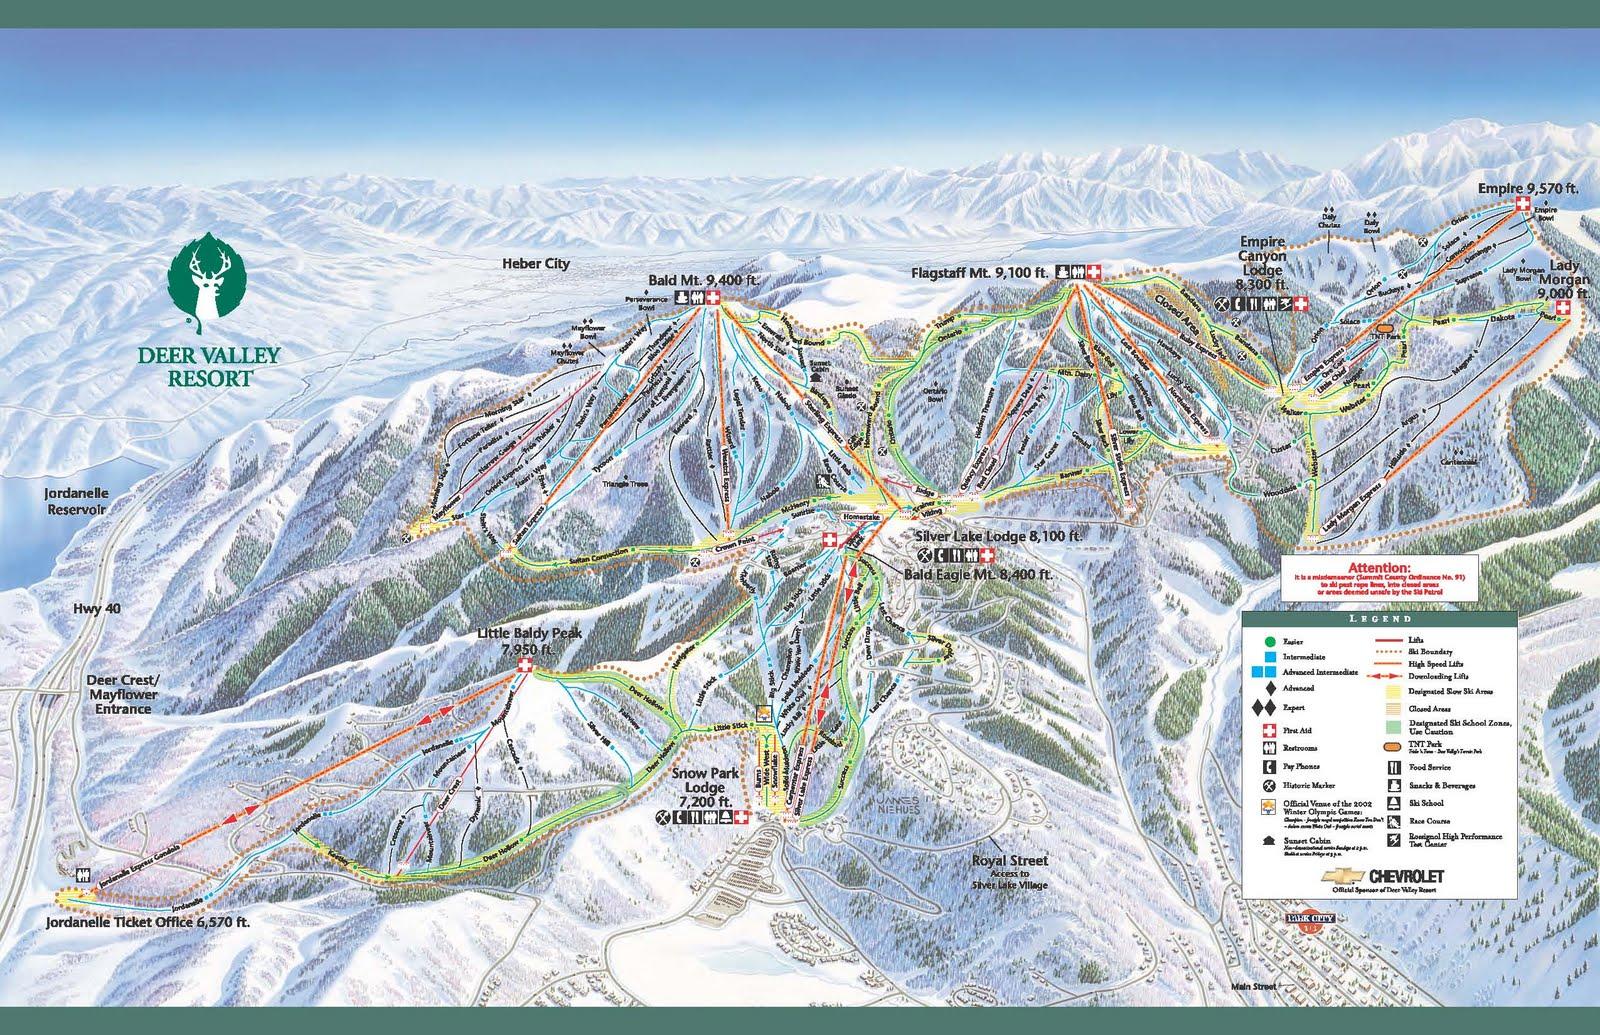 Ski Resort Reviews: Trail Maps on telluride mountain map, cascade mountains map, logan mountain map, arizona mountain map, sugarbush mountain map, alta mountain map, alpine mountain map, vail mountain map, park city mountain resort trail map, breckenridge mountain map,